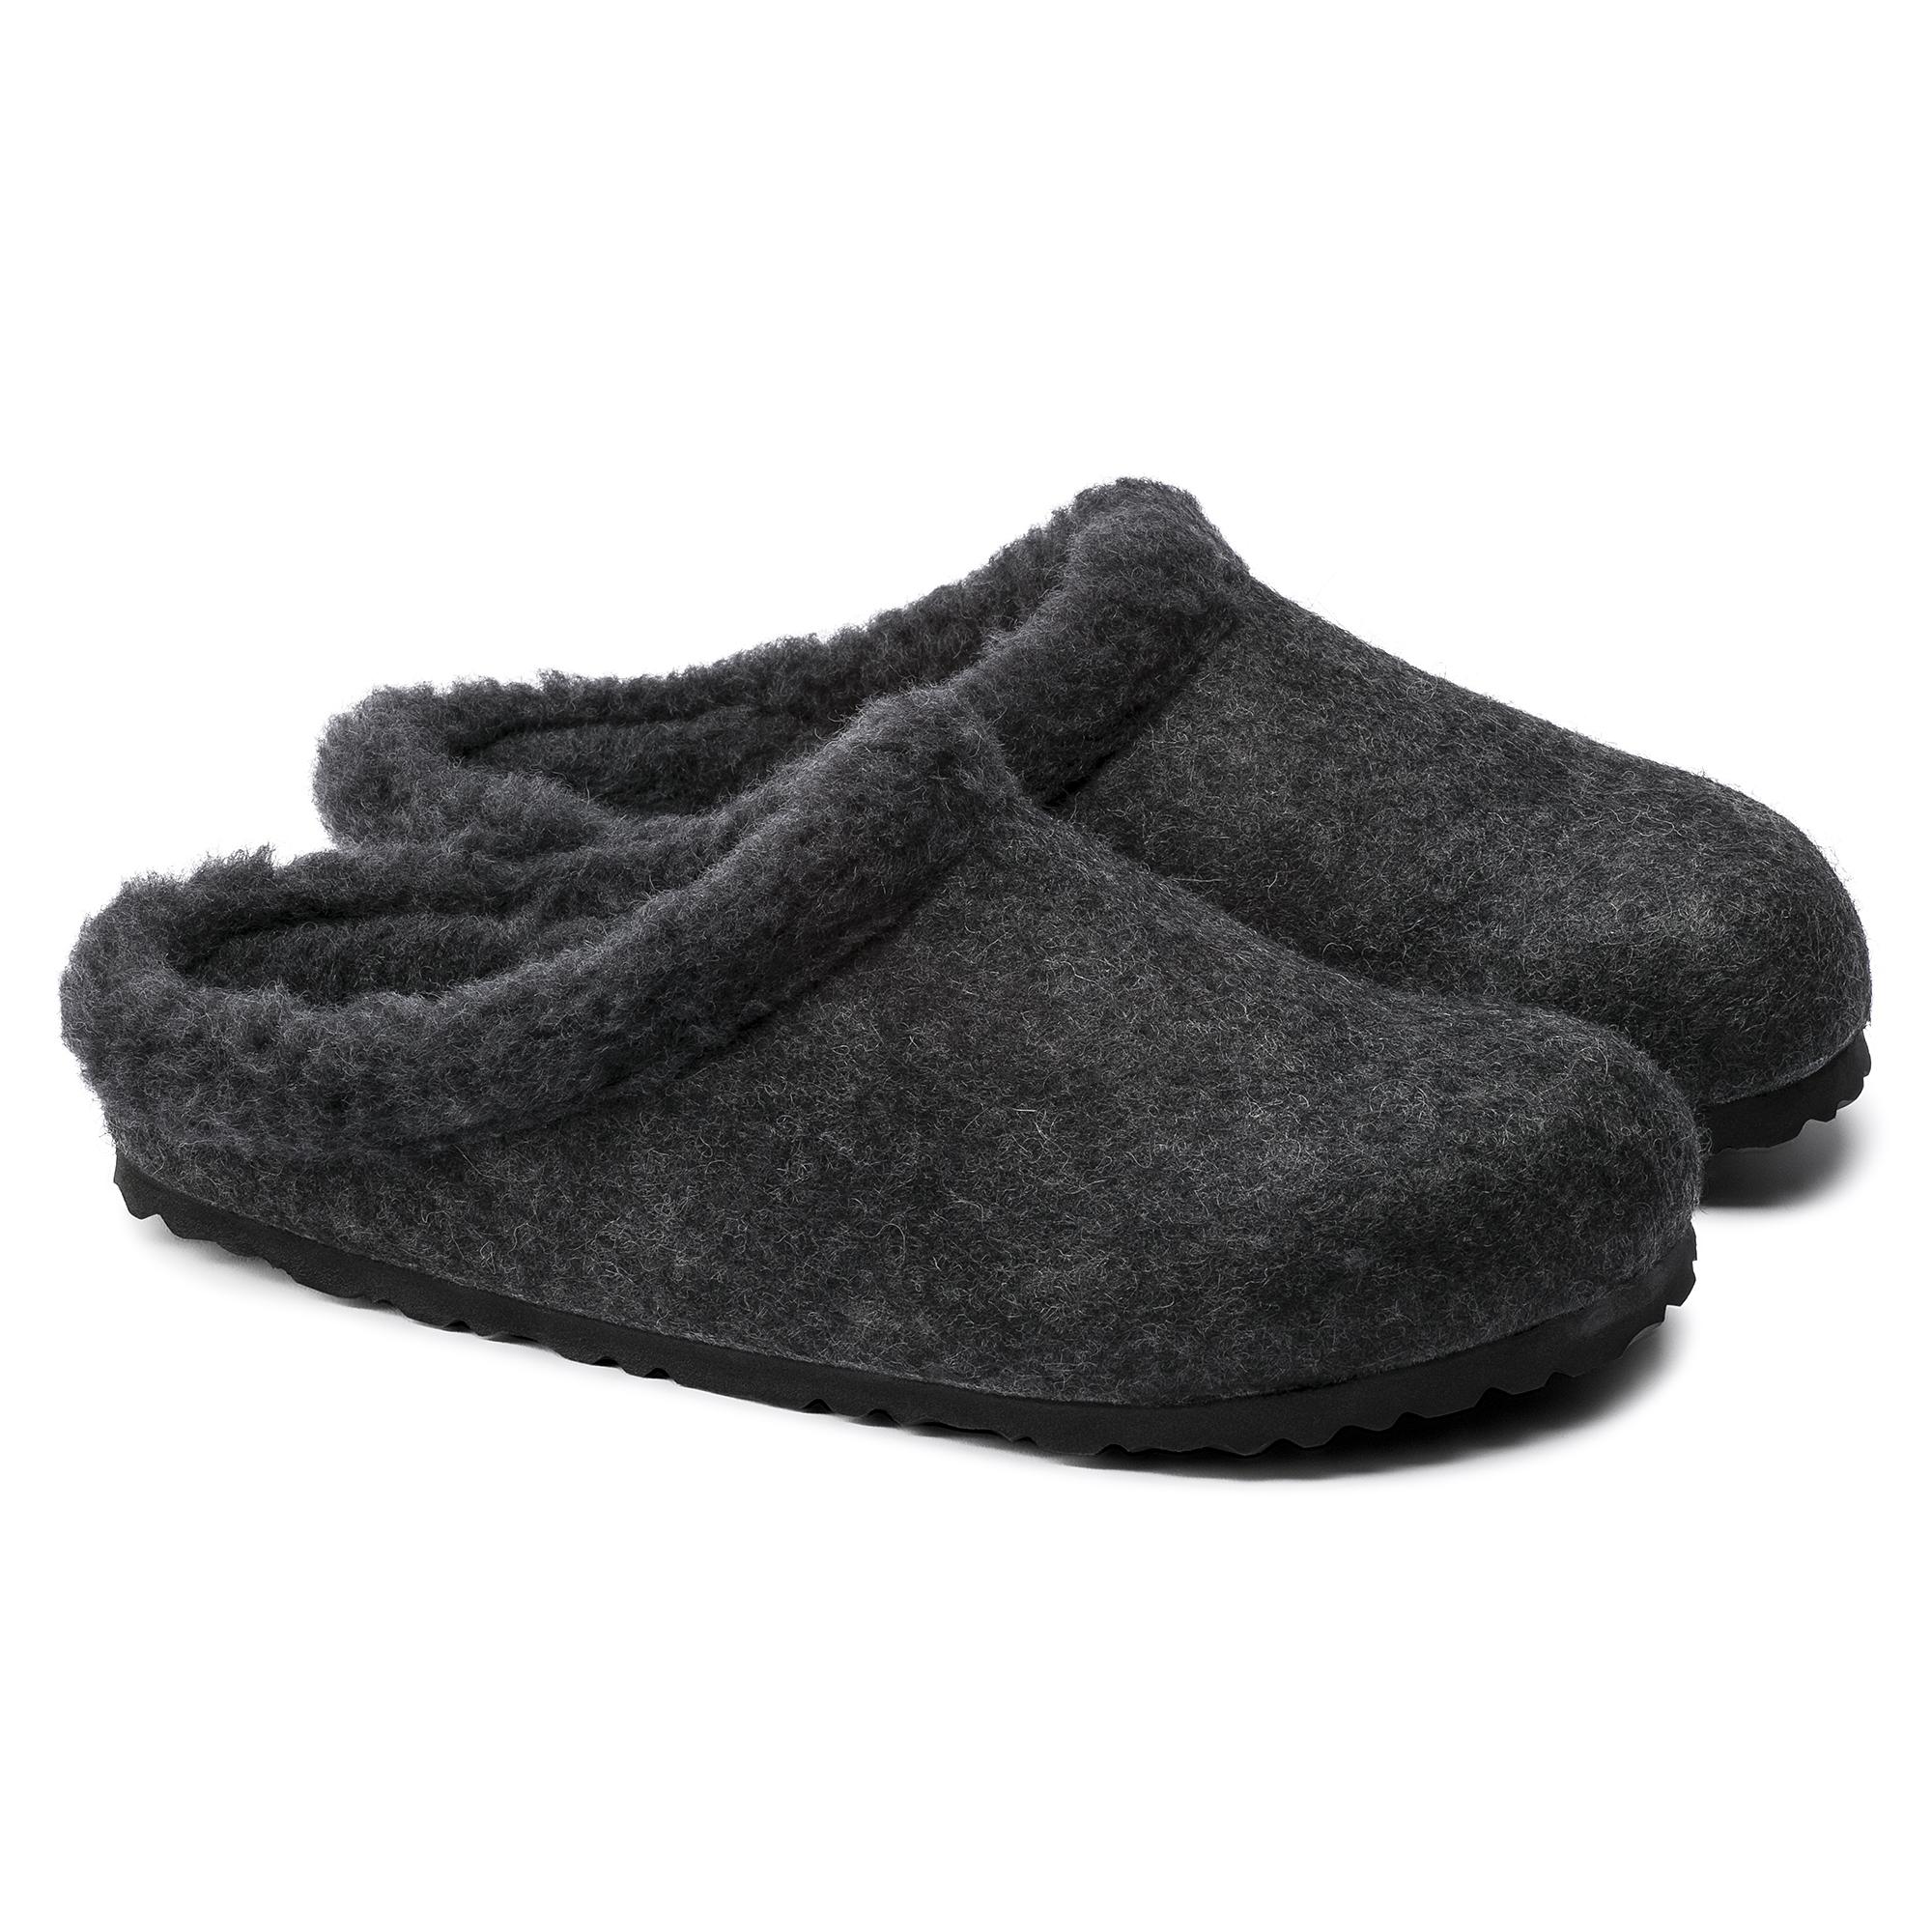 Womens Birkenstock Arizona Sandals – Narrow Width In Anthracite Happy Lamb Black